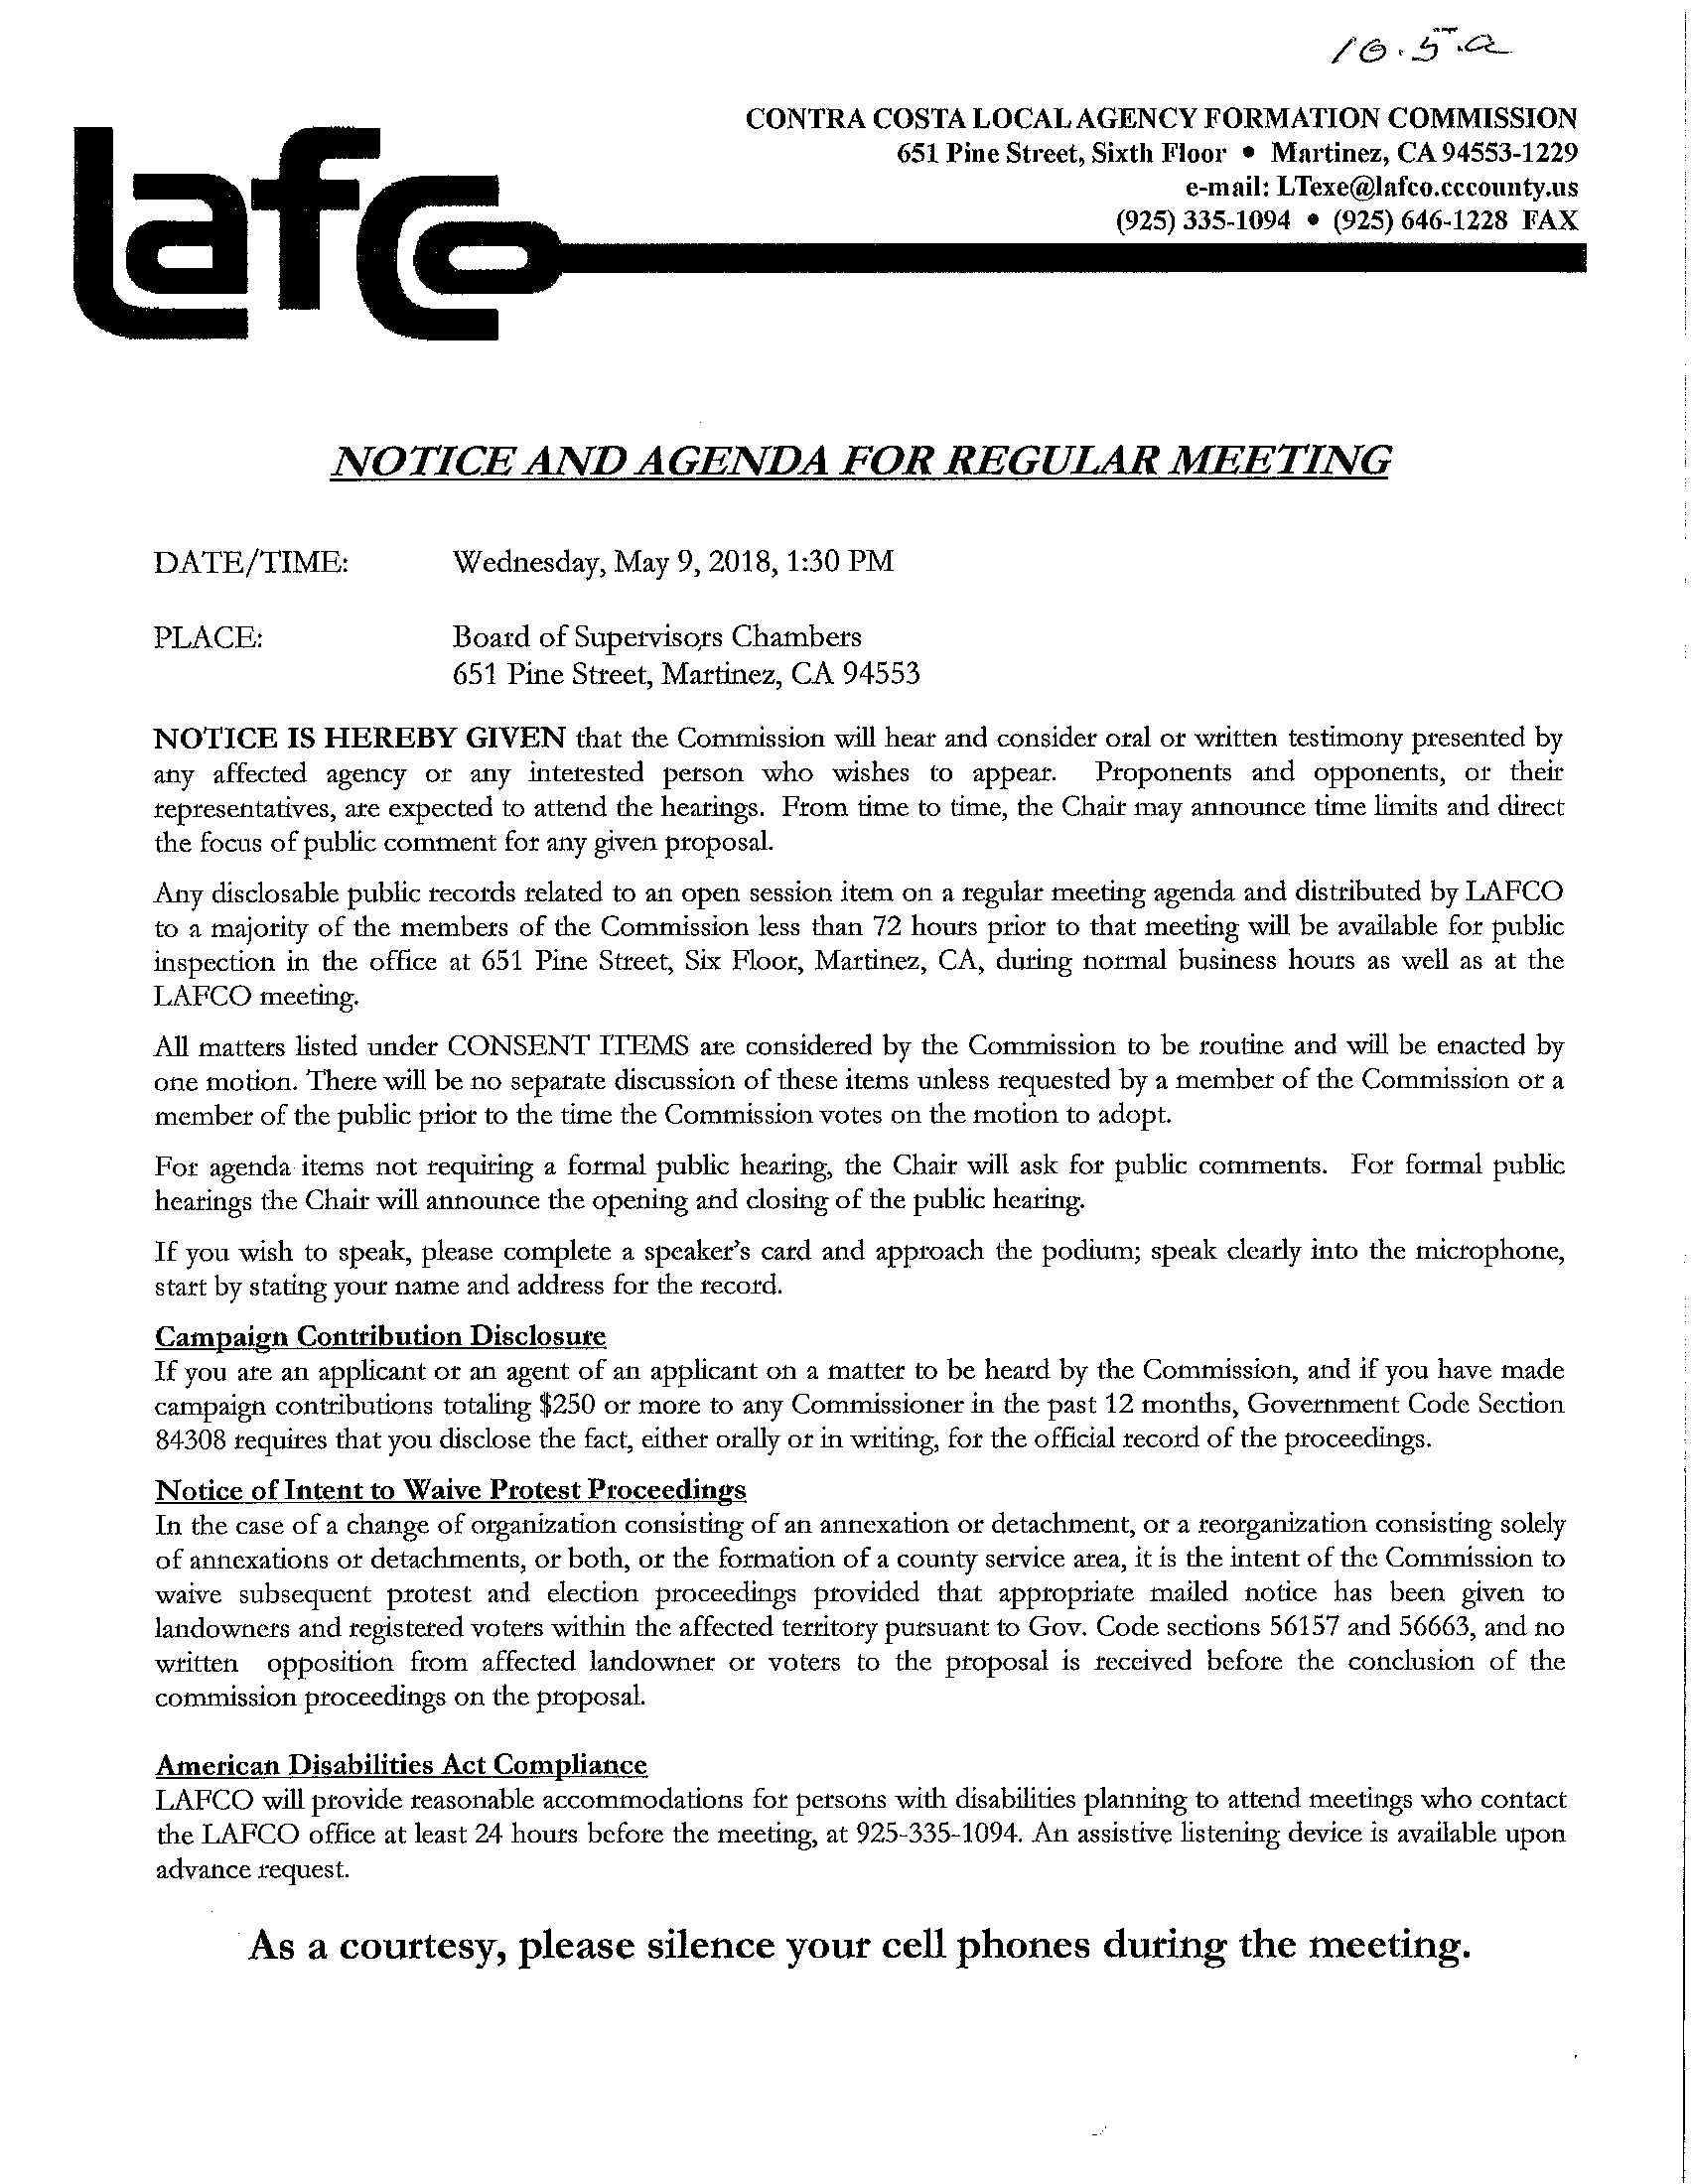 ESMAC Agenda 6.13.2018 (30 Pages)_29.jpg